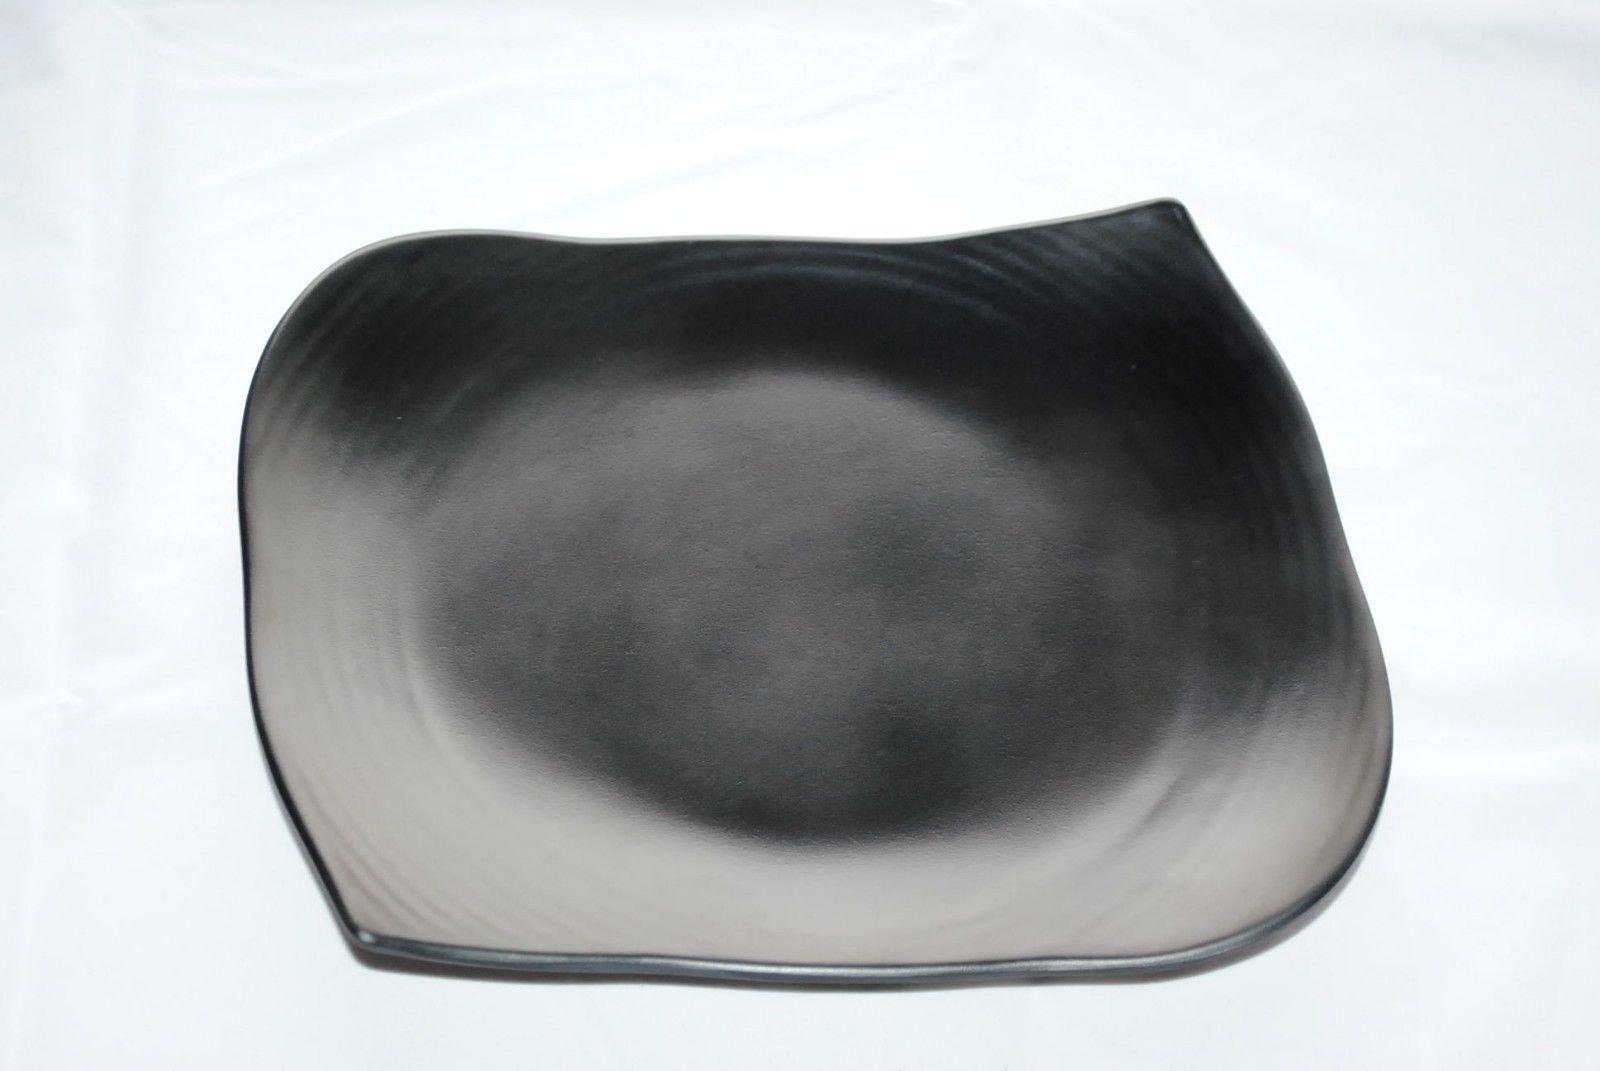 Lucky Star Rectangular Melamine Plates Sushi Sashimi Tonkatsu Tempura Appetizer Platter Dishes, 9'' X 7'', 10-1/2'' X 8-1/4'', 12'' X 9-3/8'', Black (40, 10-1/2'' X 8-1/4'')